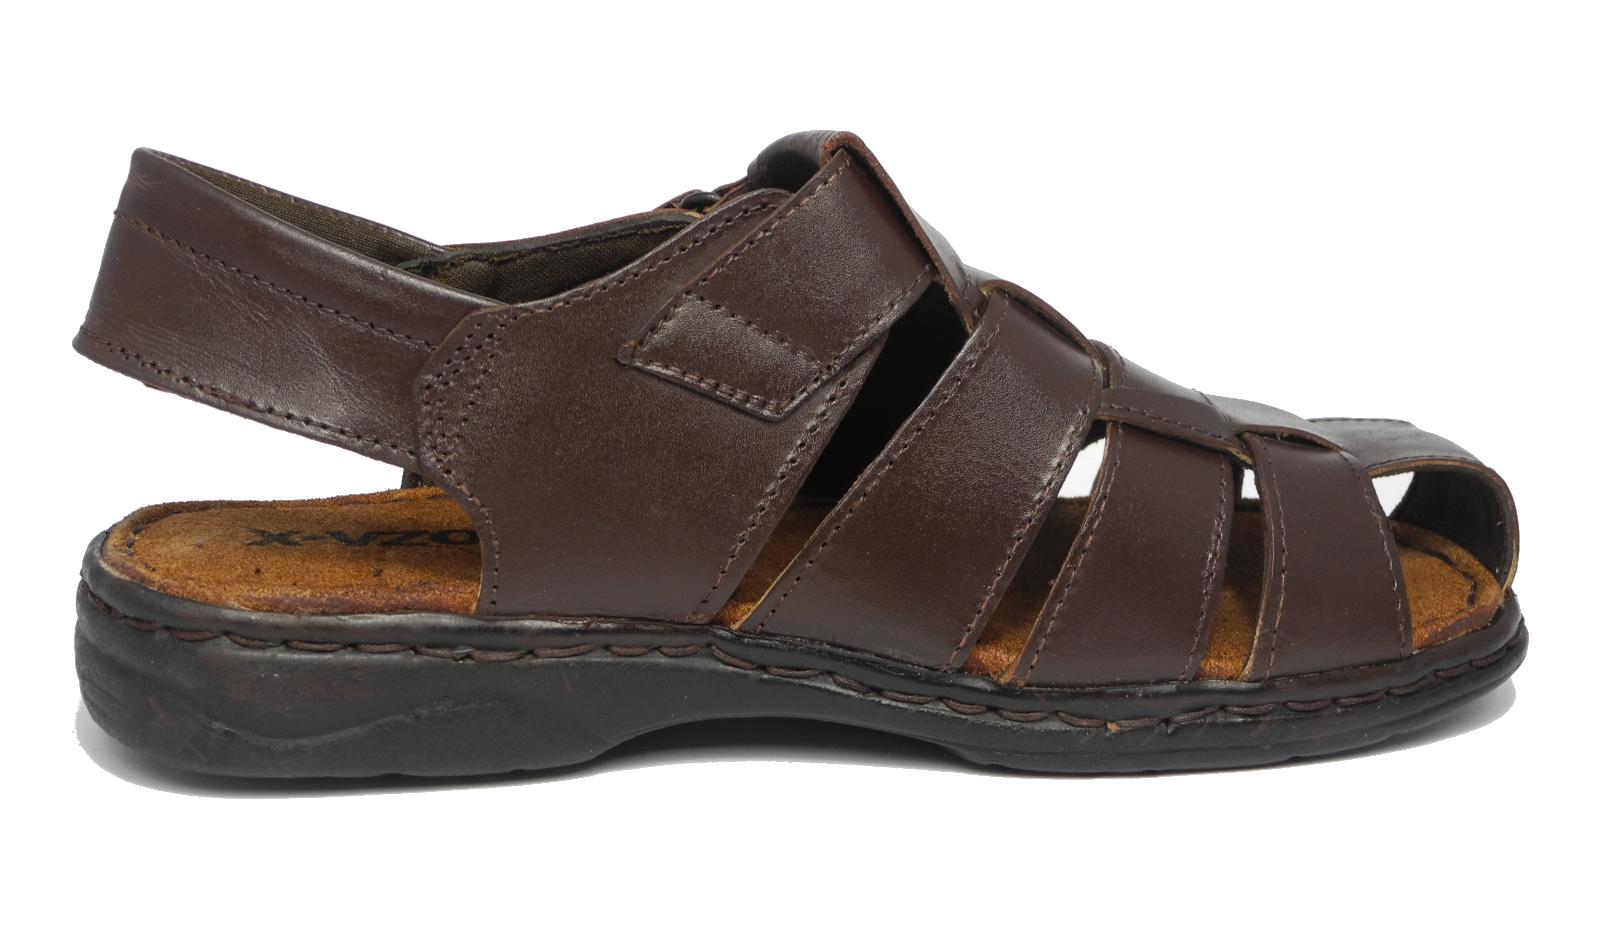 Black enclosed sandals - Mens Leather Sandals Closed Toe